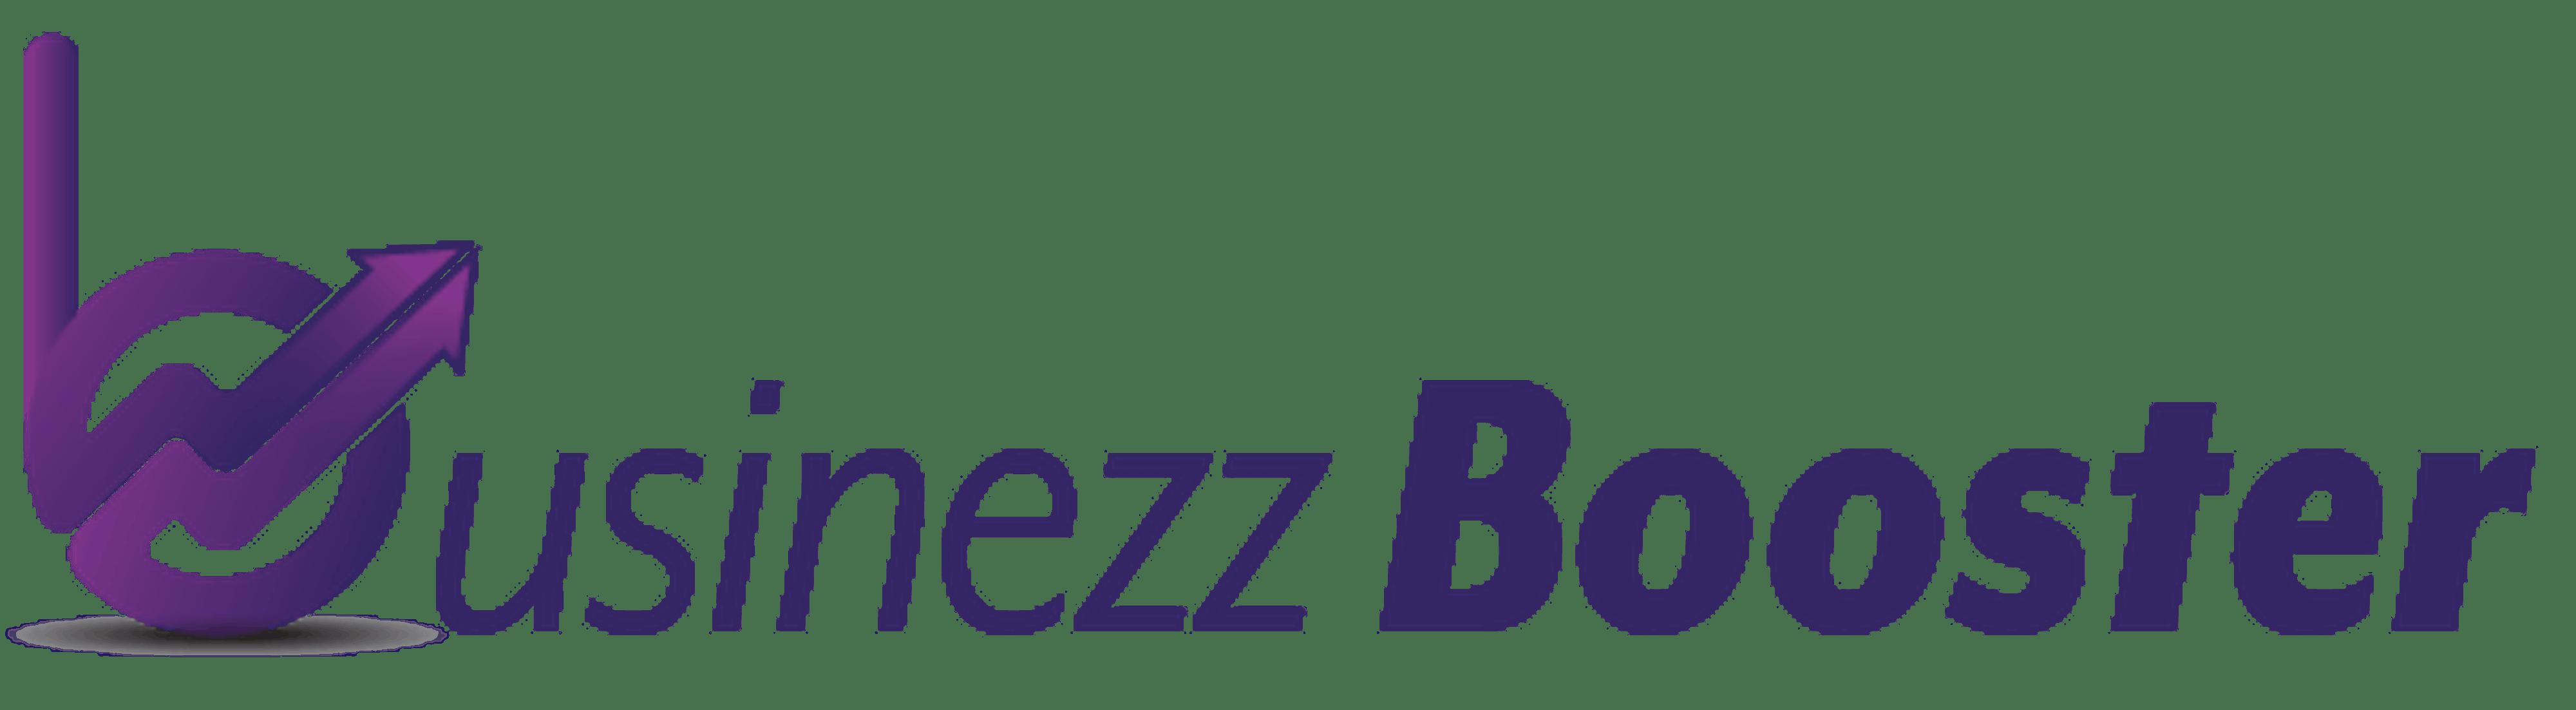 Carrièrekansen Businezz Booster - Commerciële vacatures logo